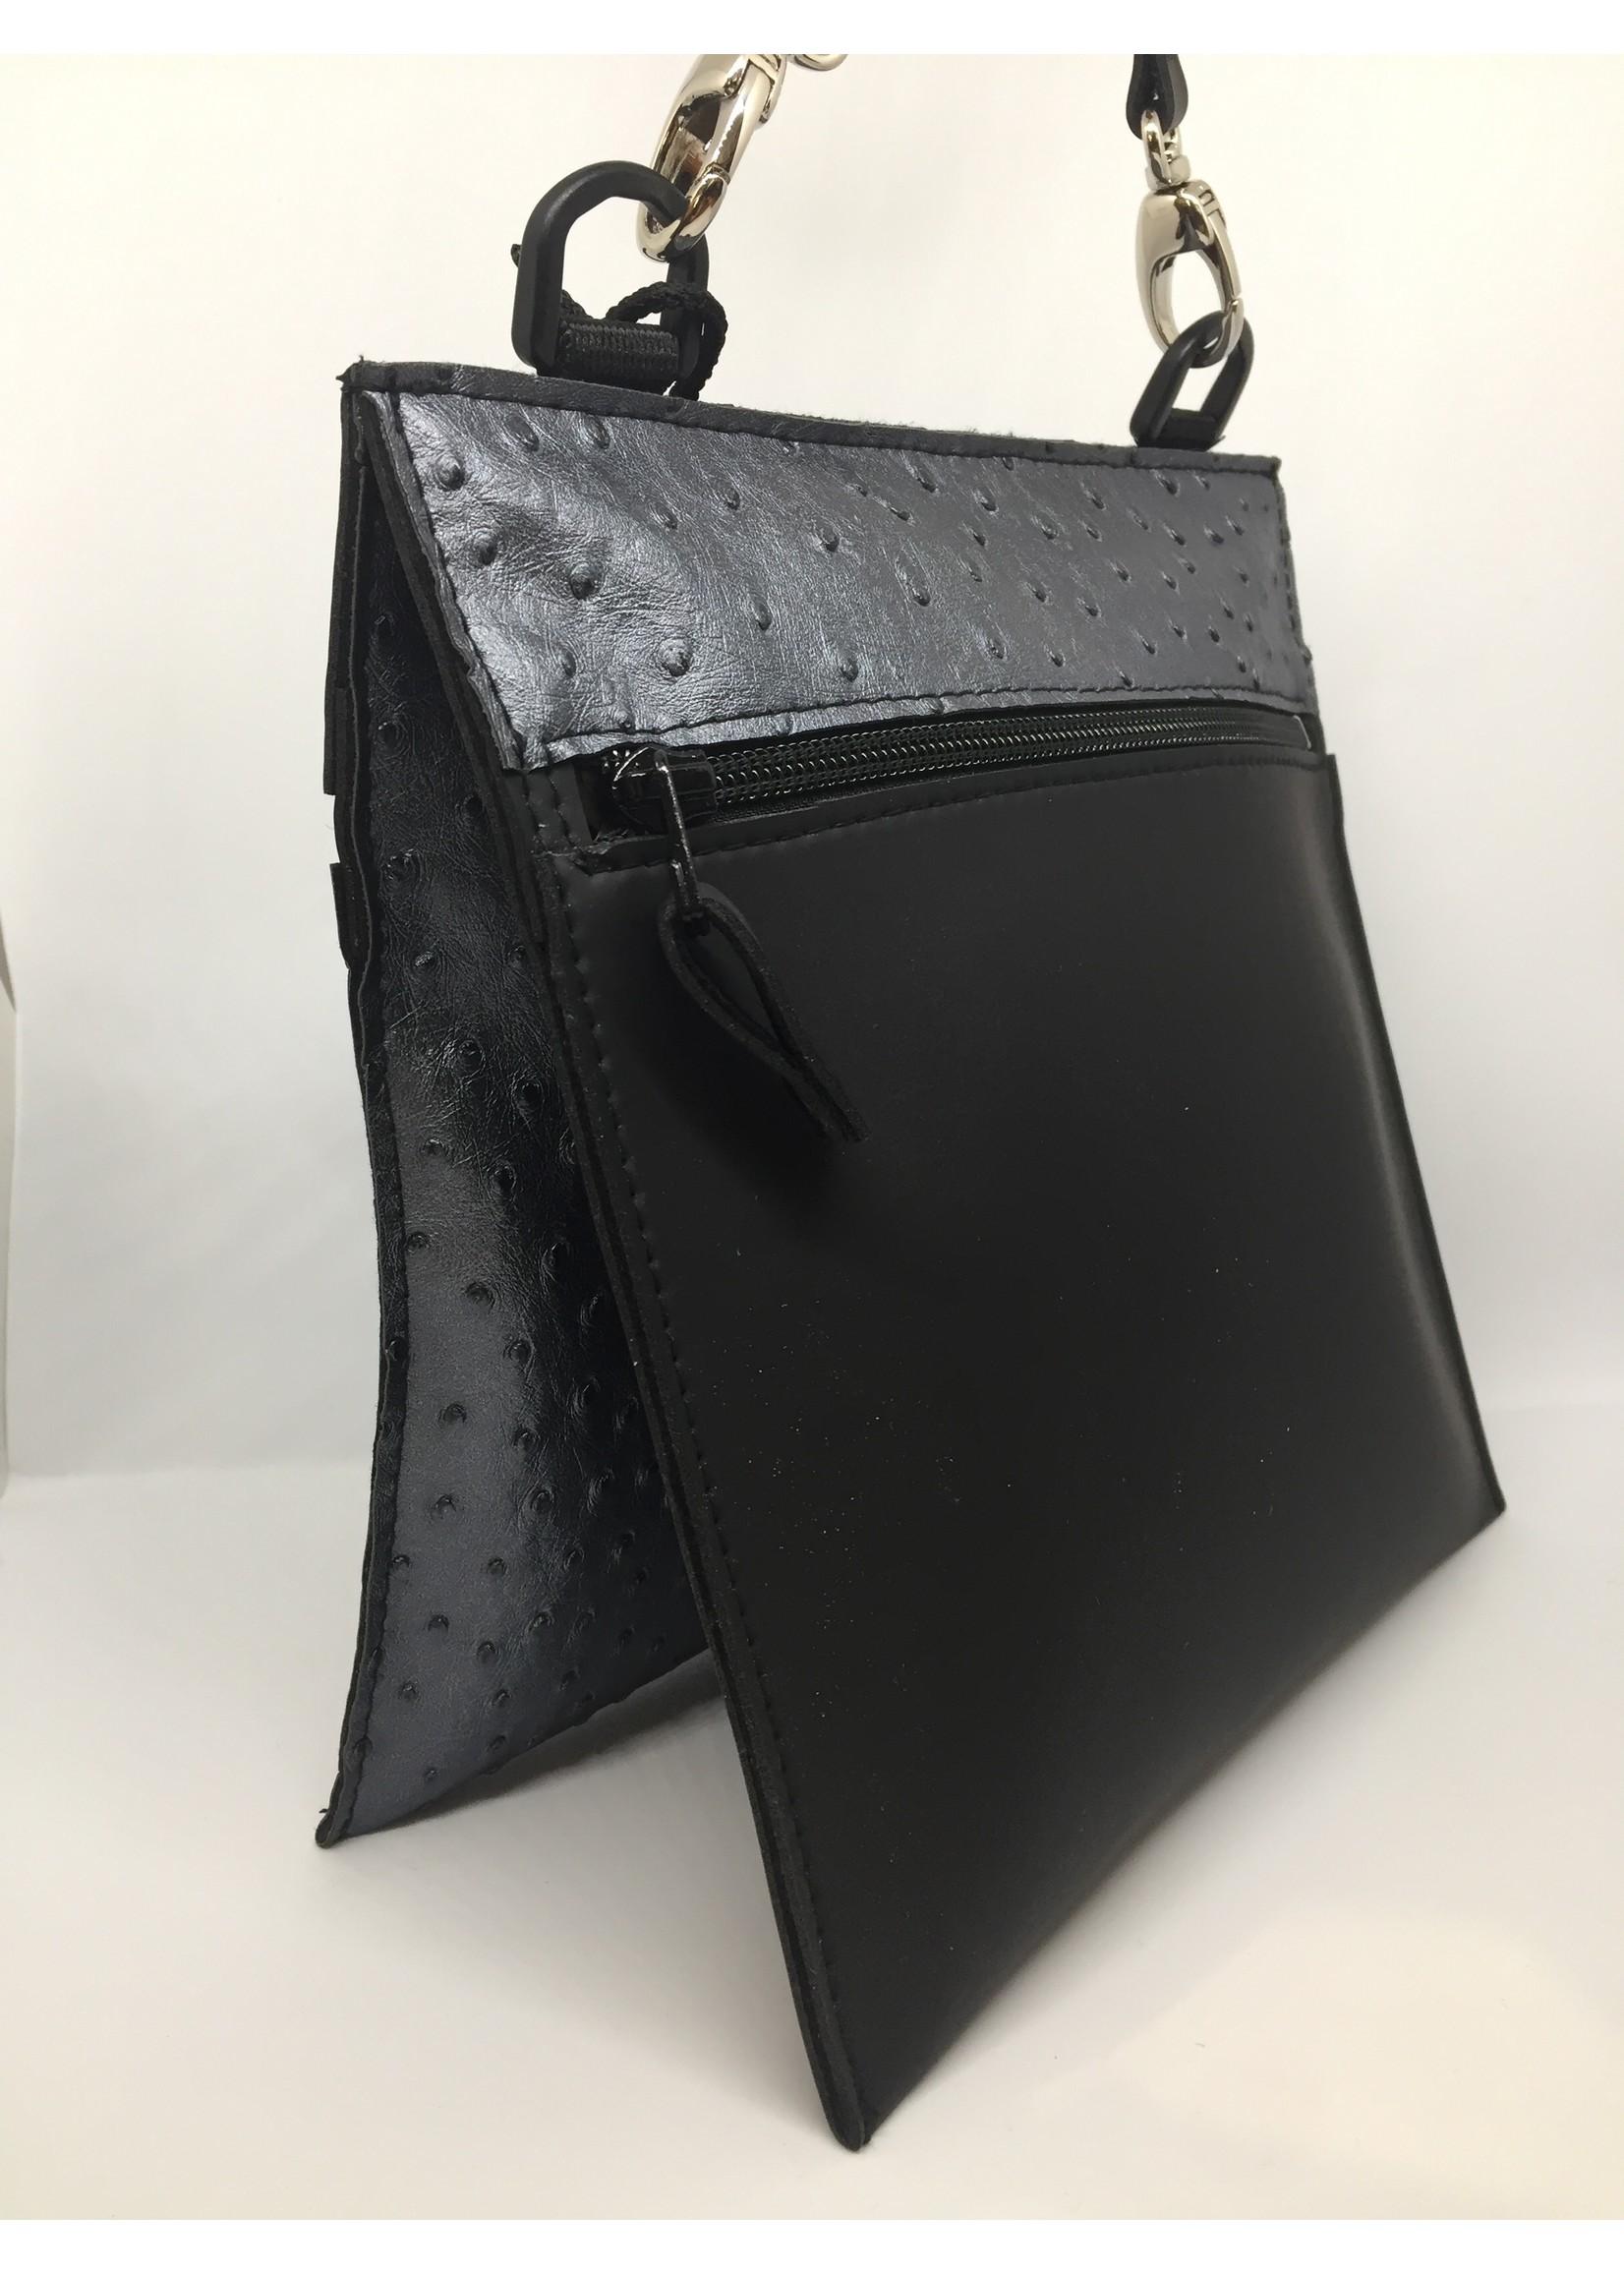 Maria La verda bag black / steel